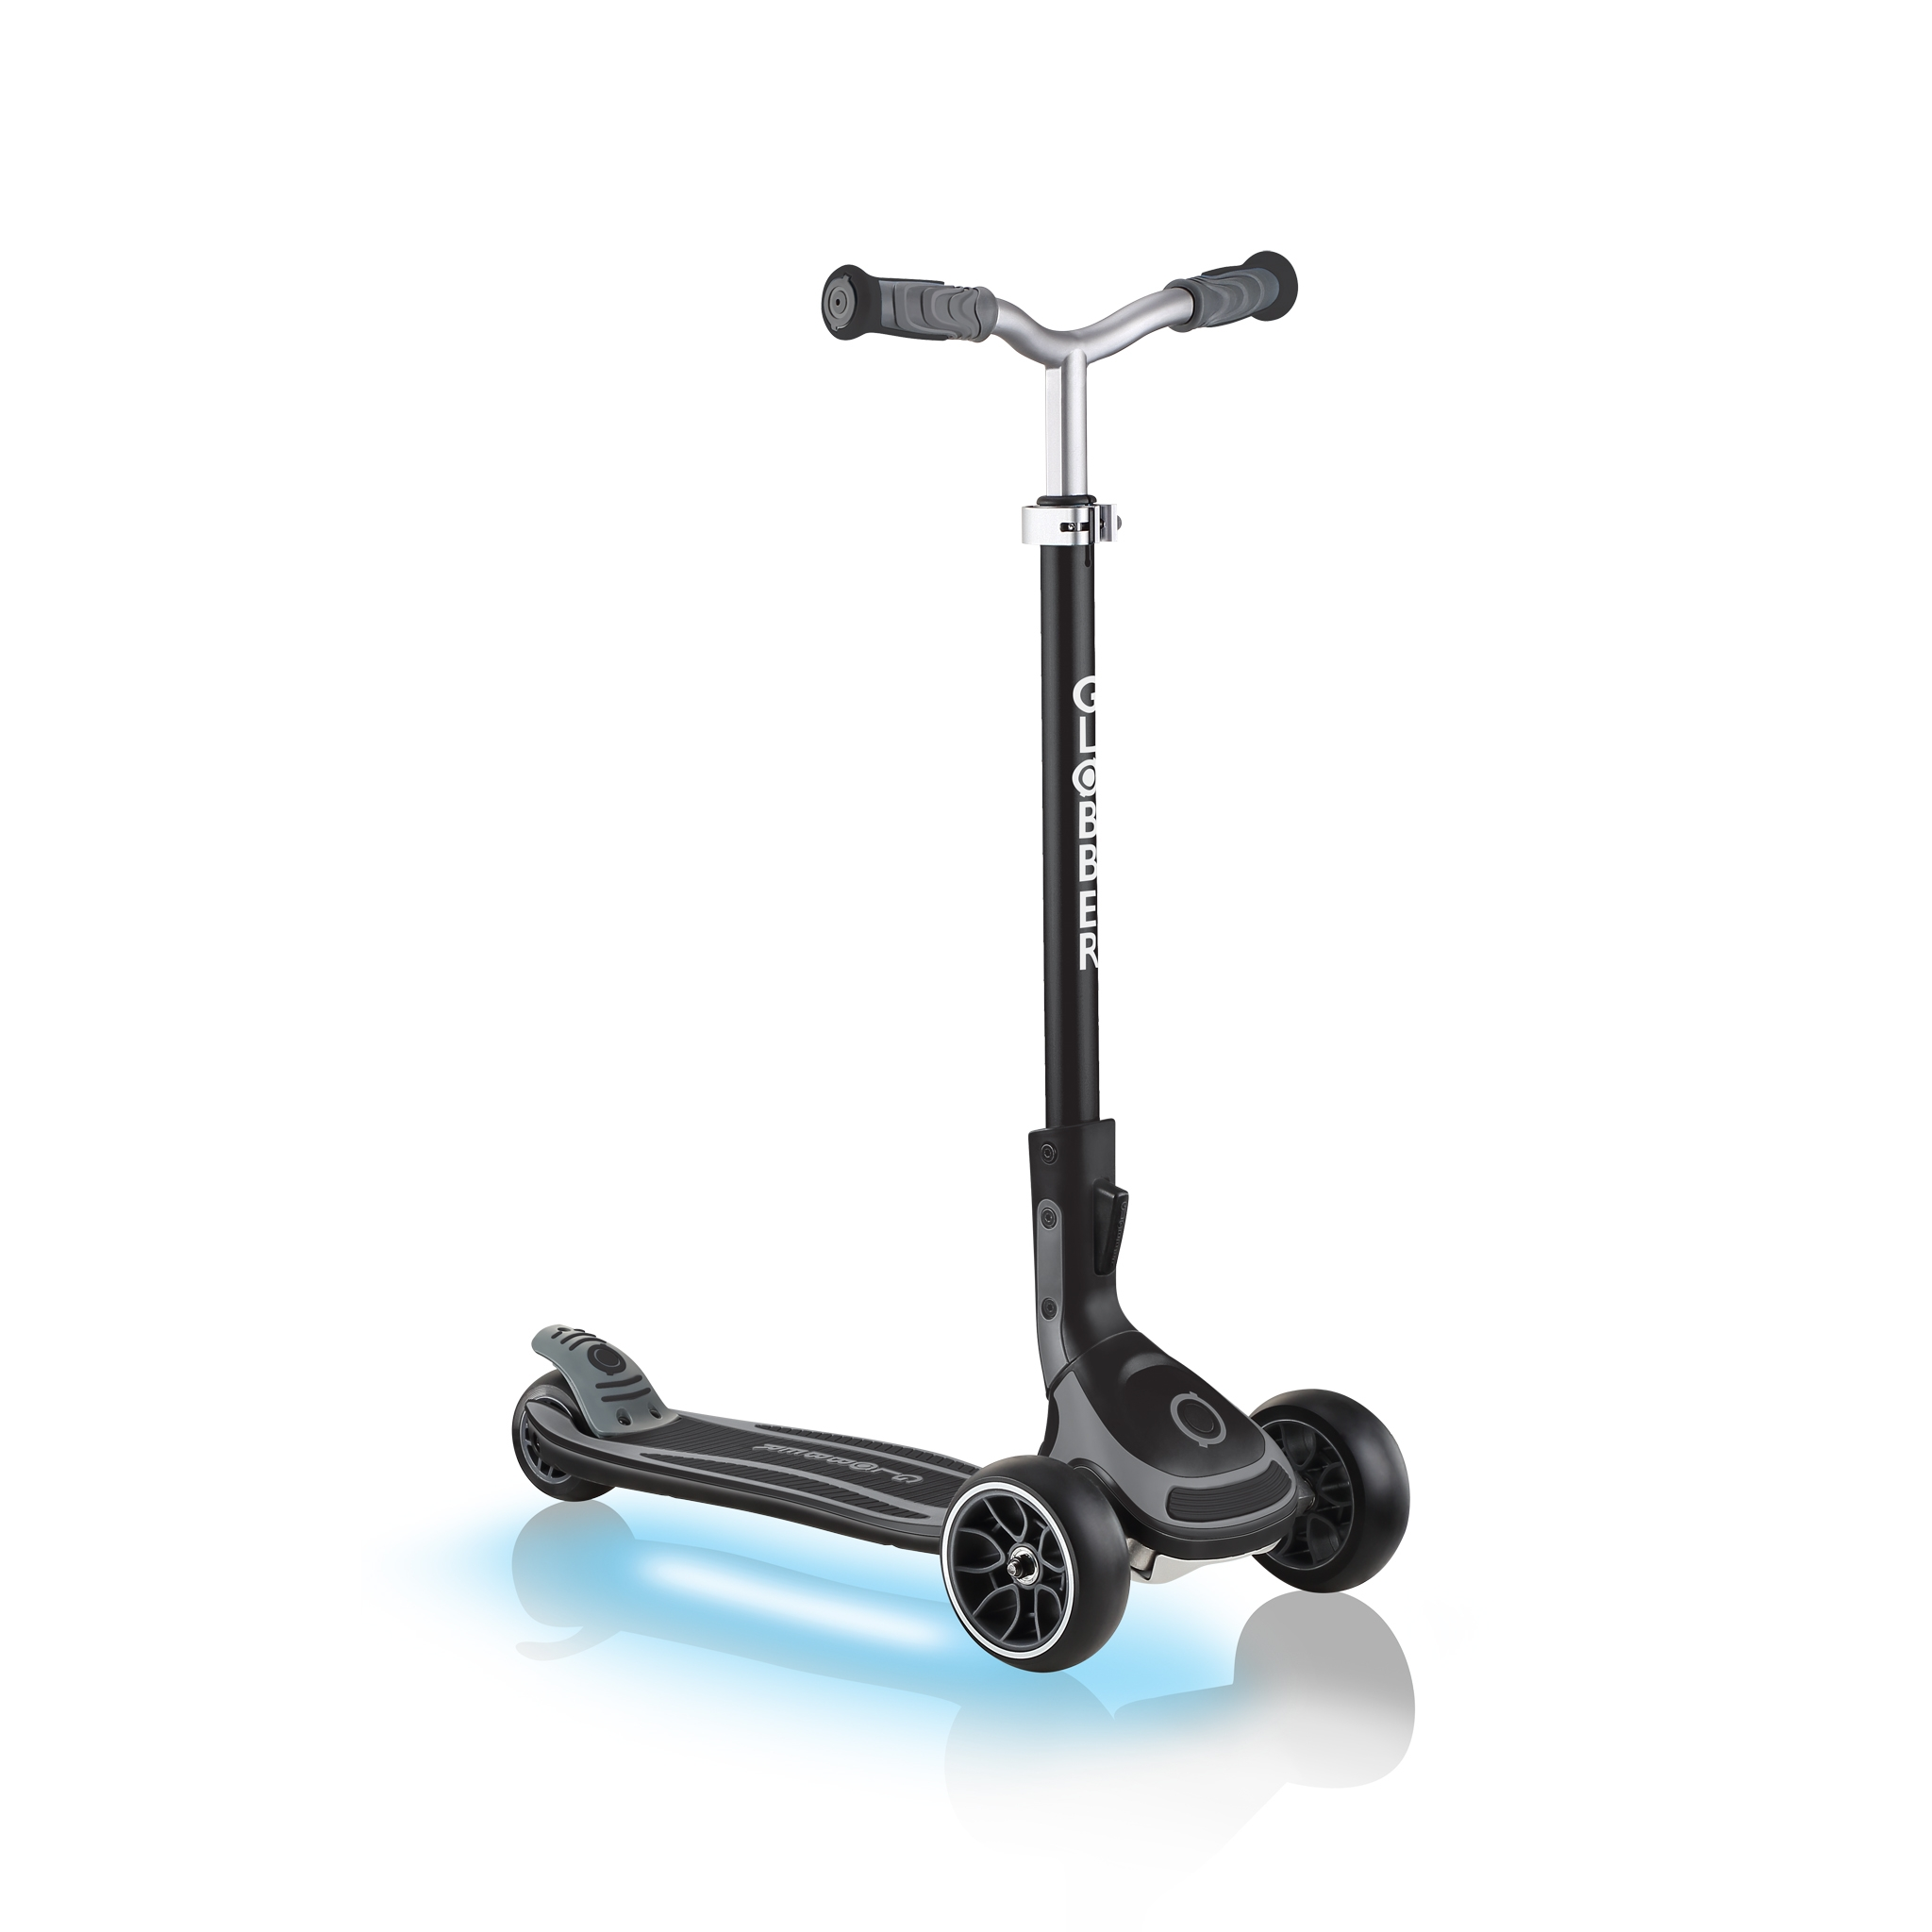 ULTIMUM-LIGHTS-3-wheel-light-up-scooter-for-kids-and-teens-black 0